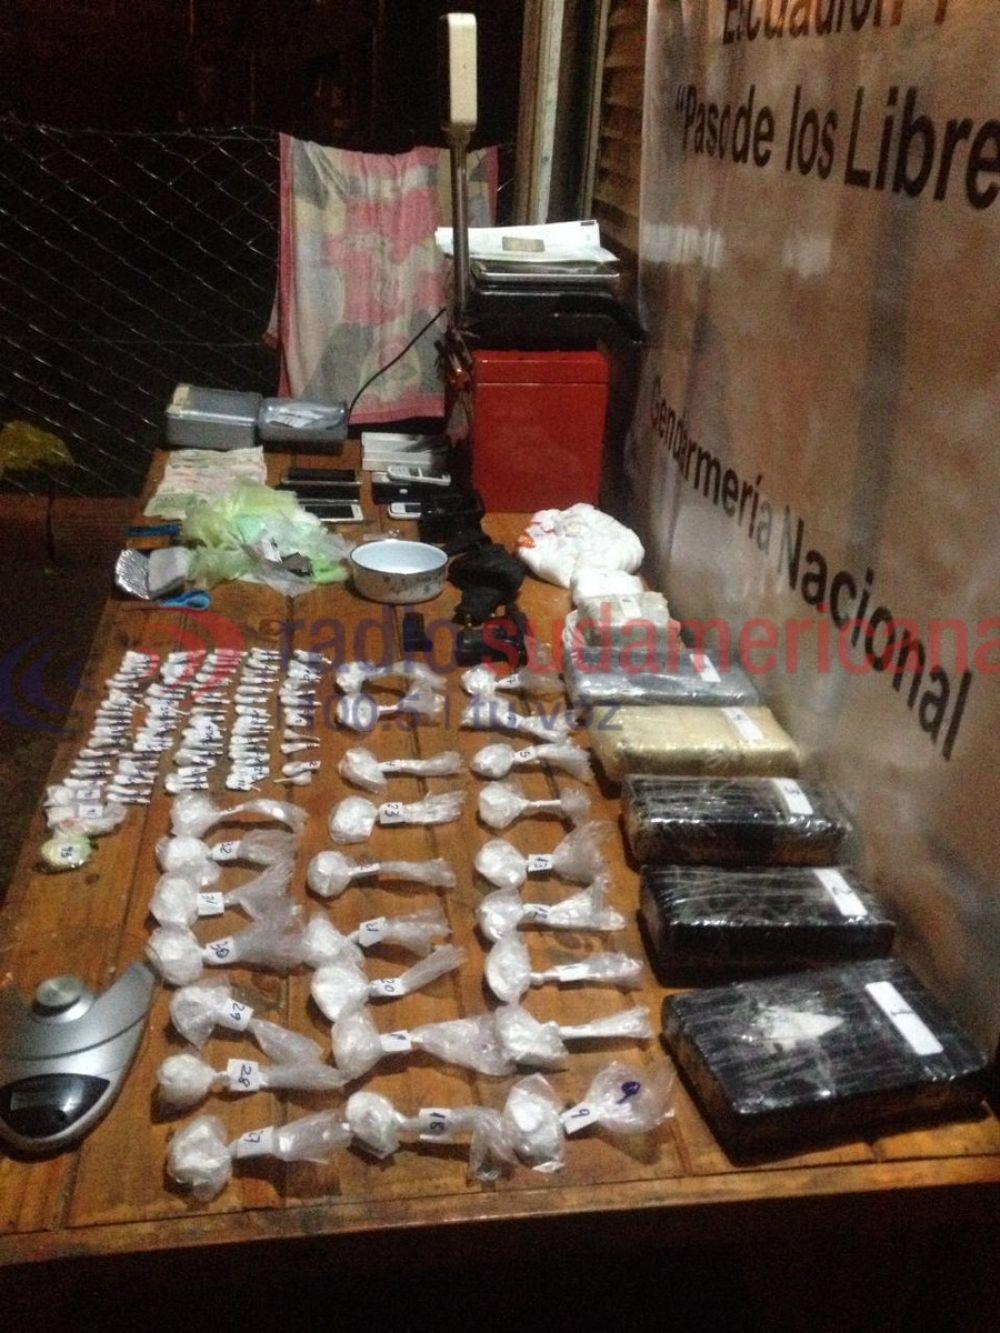 foto: Desarticularon un bunker de droga que vendía cocaína al menudeo